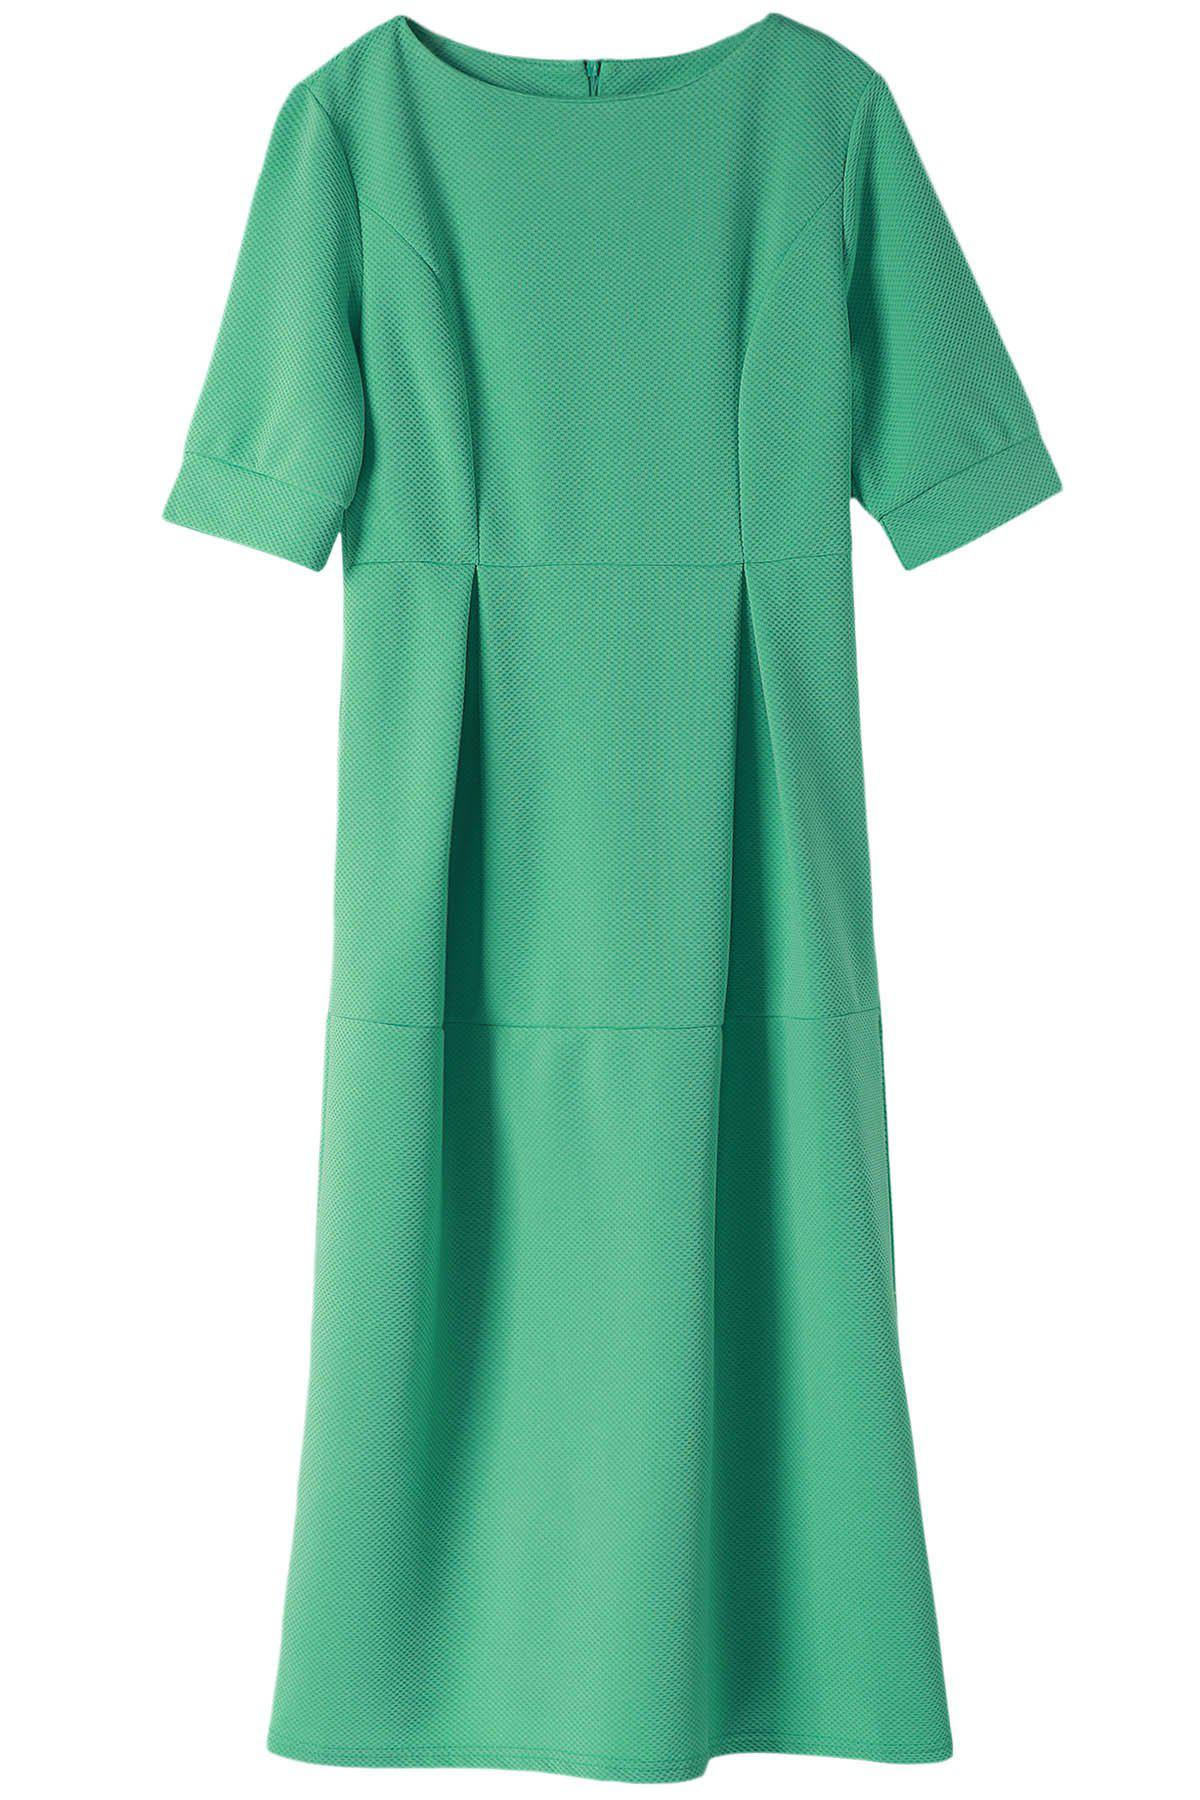 Light Blue Half Sleeve Dress